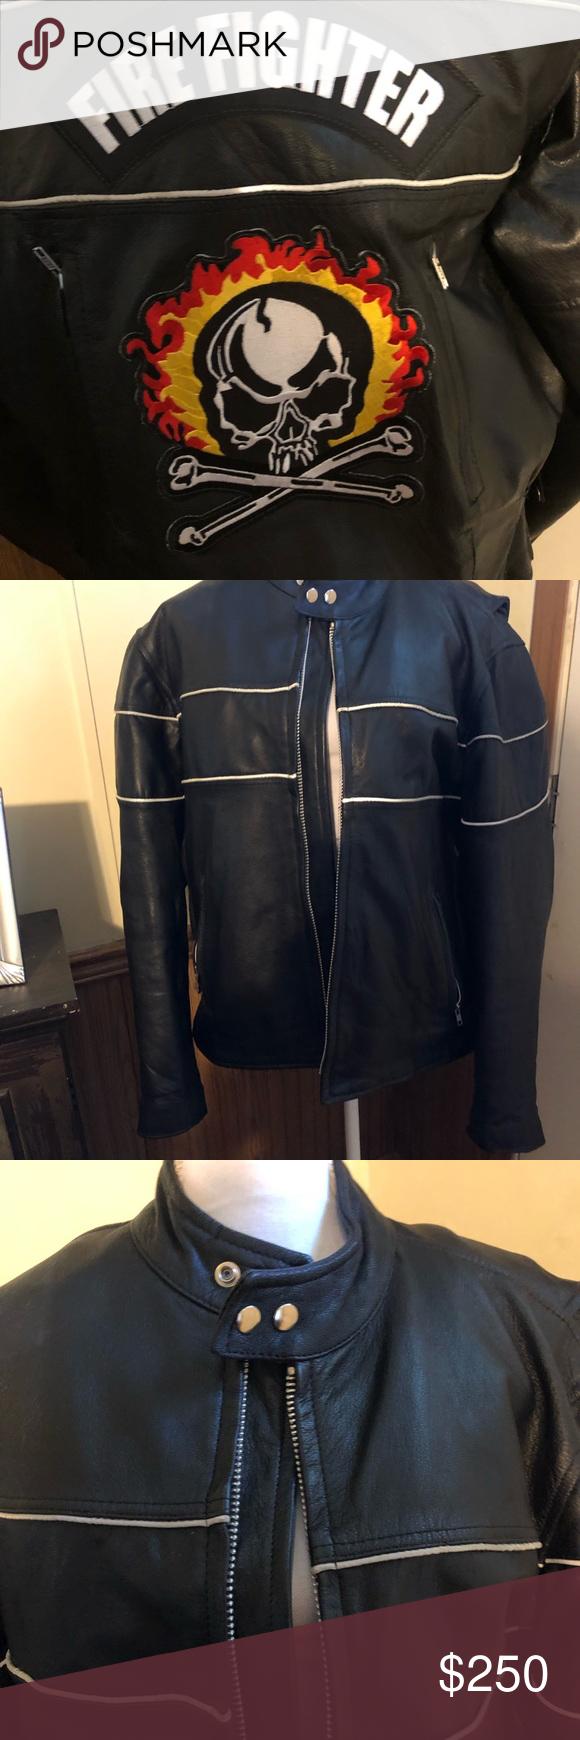 Hudson Leather Jacket New W O Tags Leather Jacket Firefighter Jacket Jackets [ 1740 x 580 Pixel ]